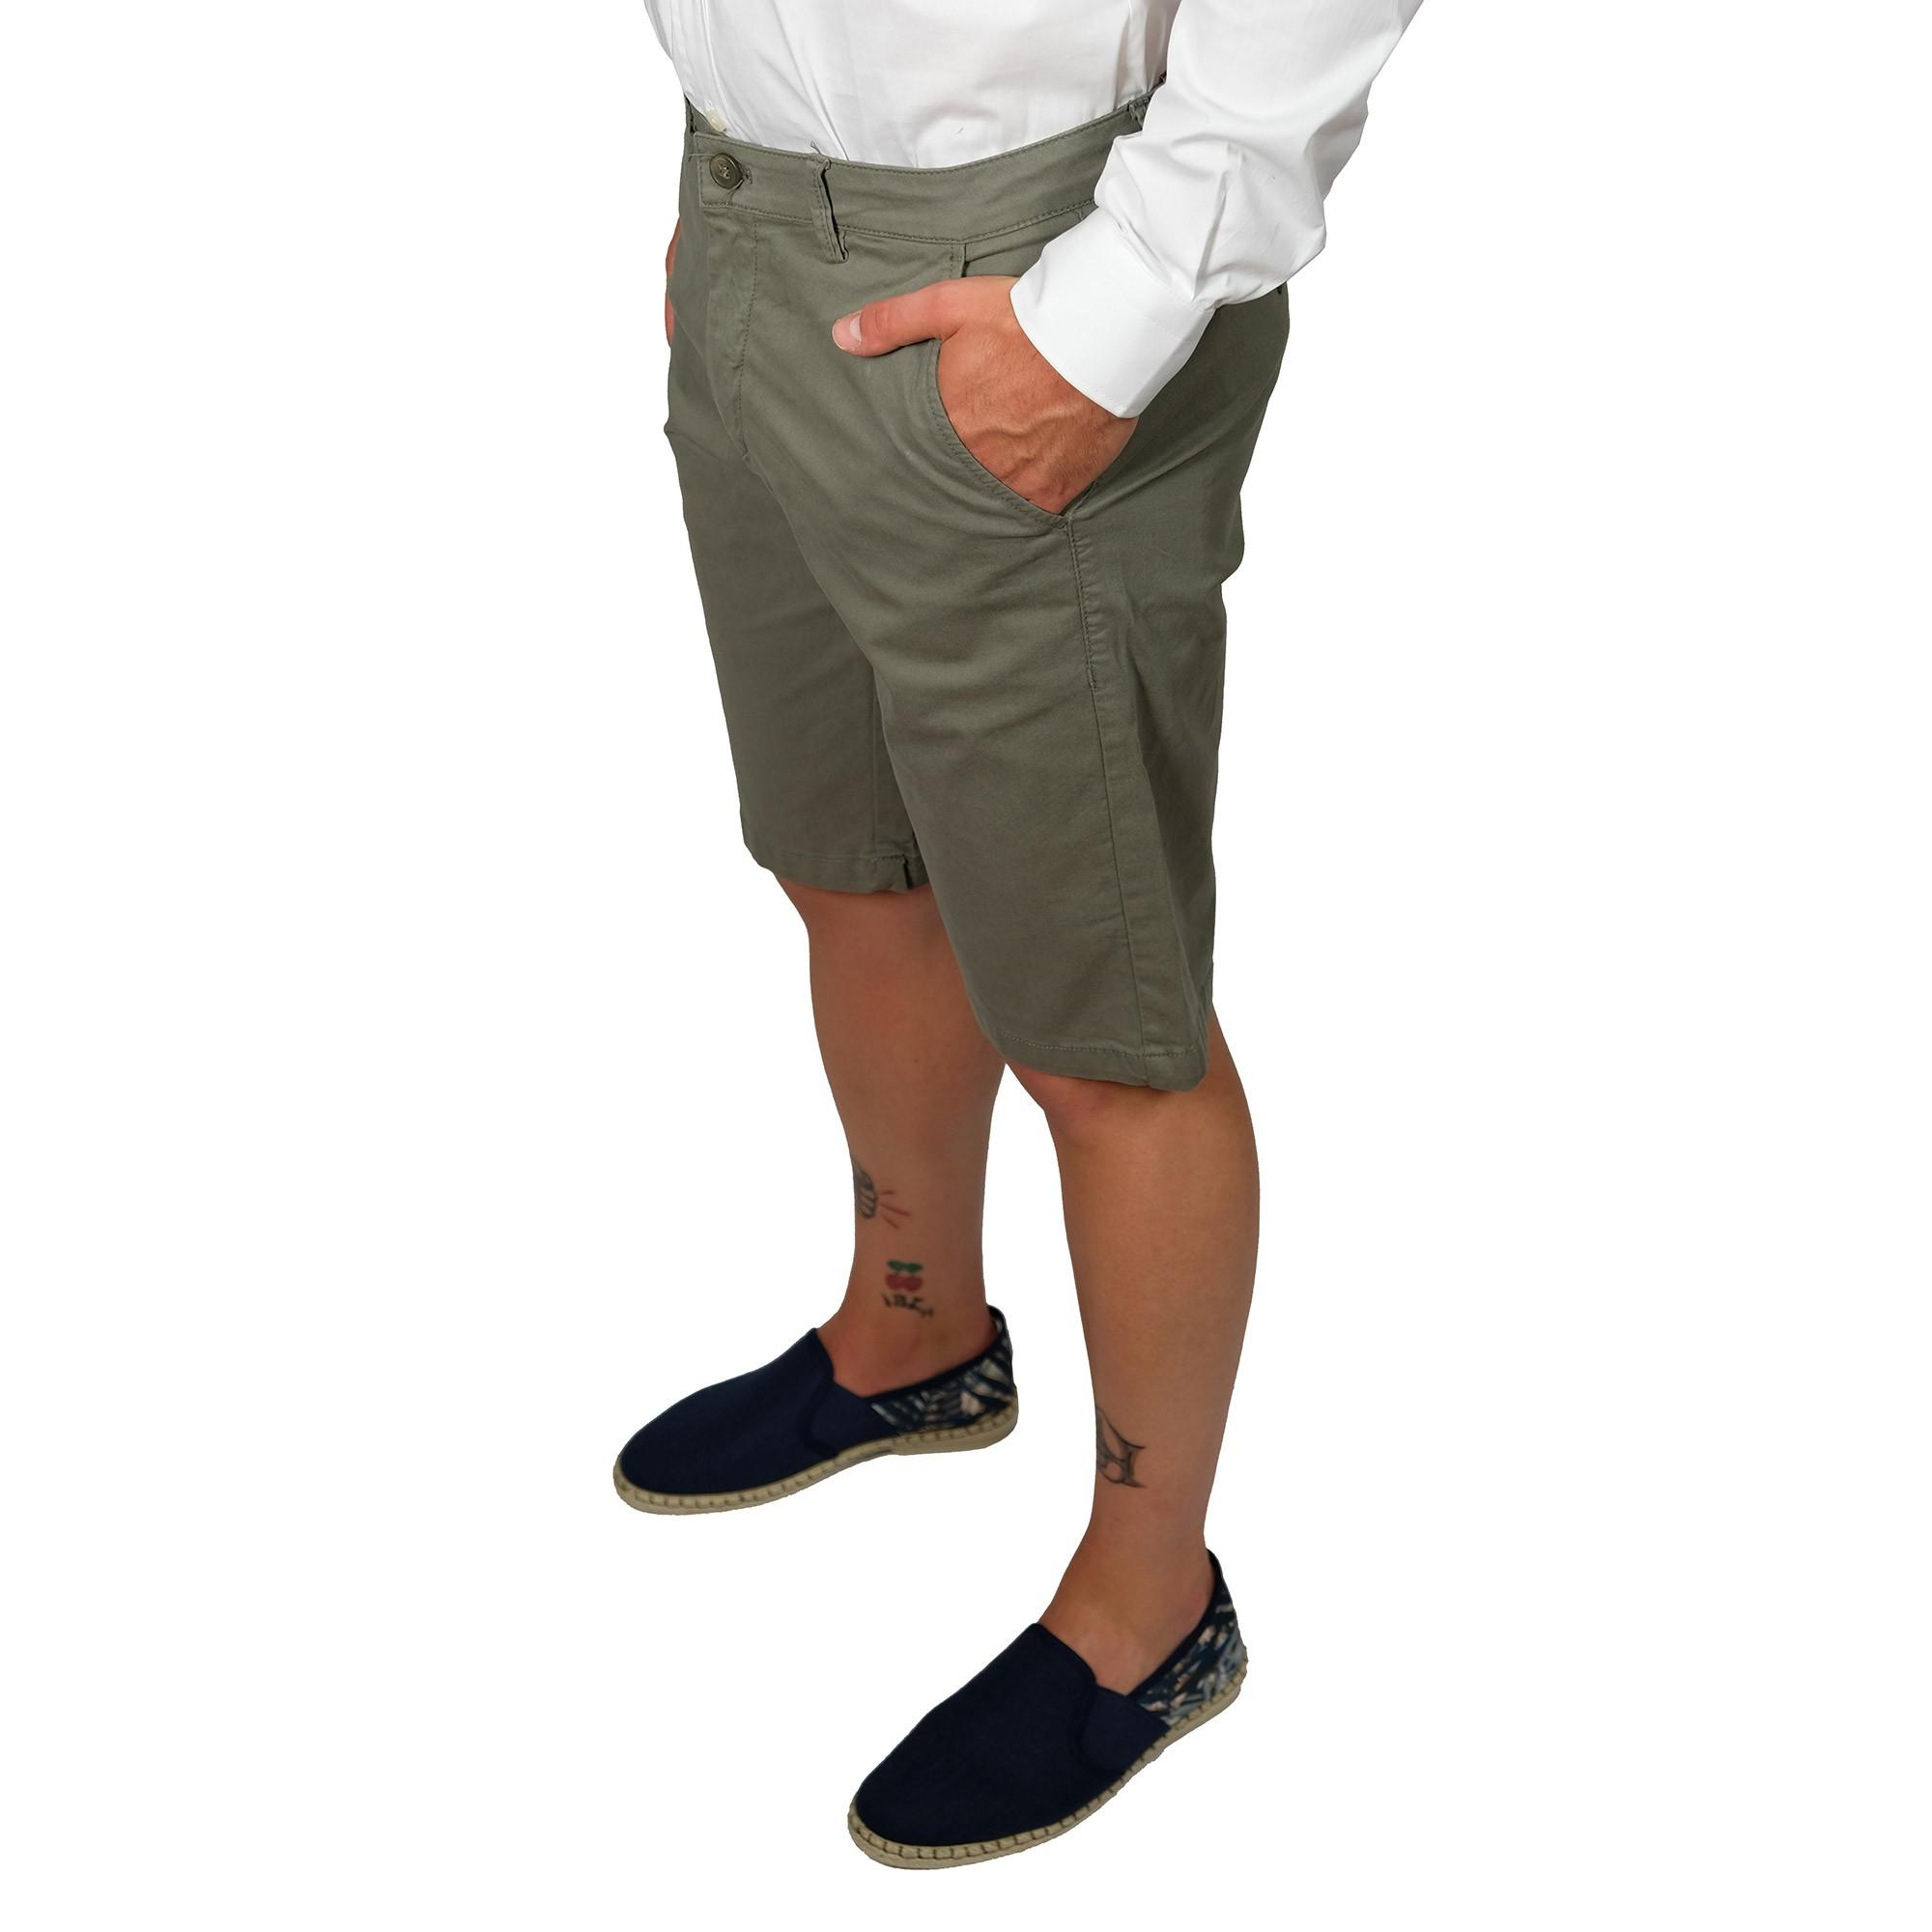 Bermuda-Uomo-Cotone-Jeans-Pantaloncini-Pantaloni-Corti-Tasca-America-Slim-Shorts miniatura 9